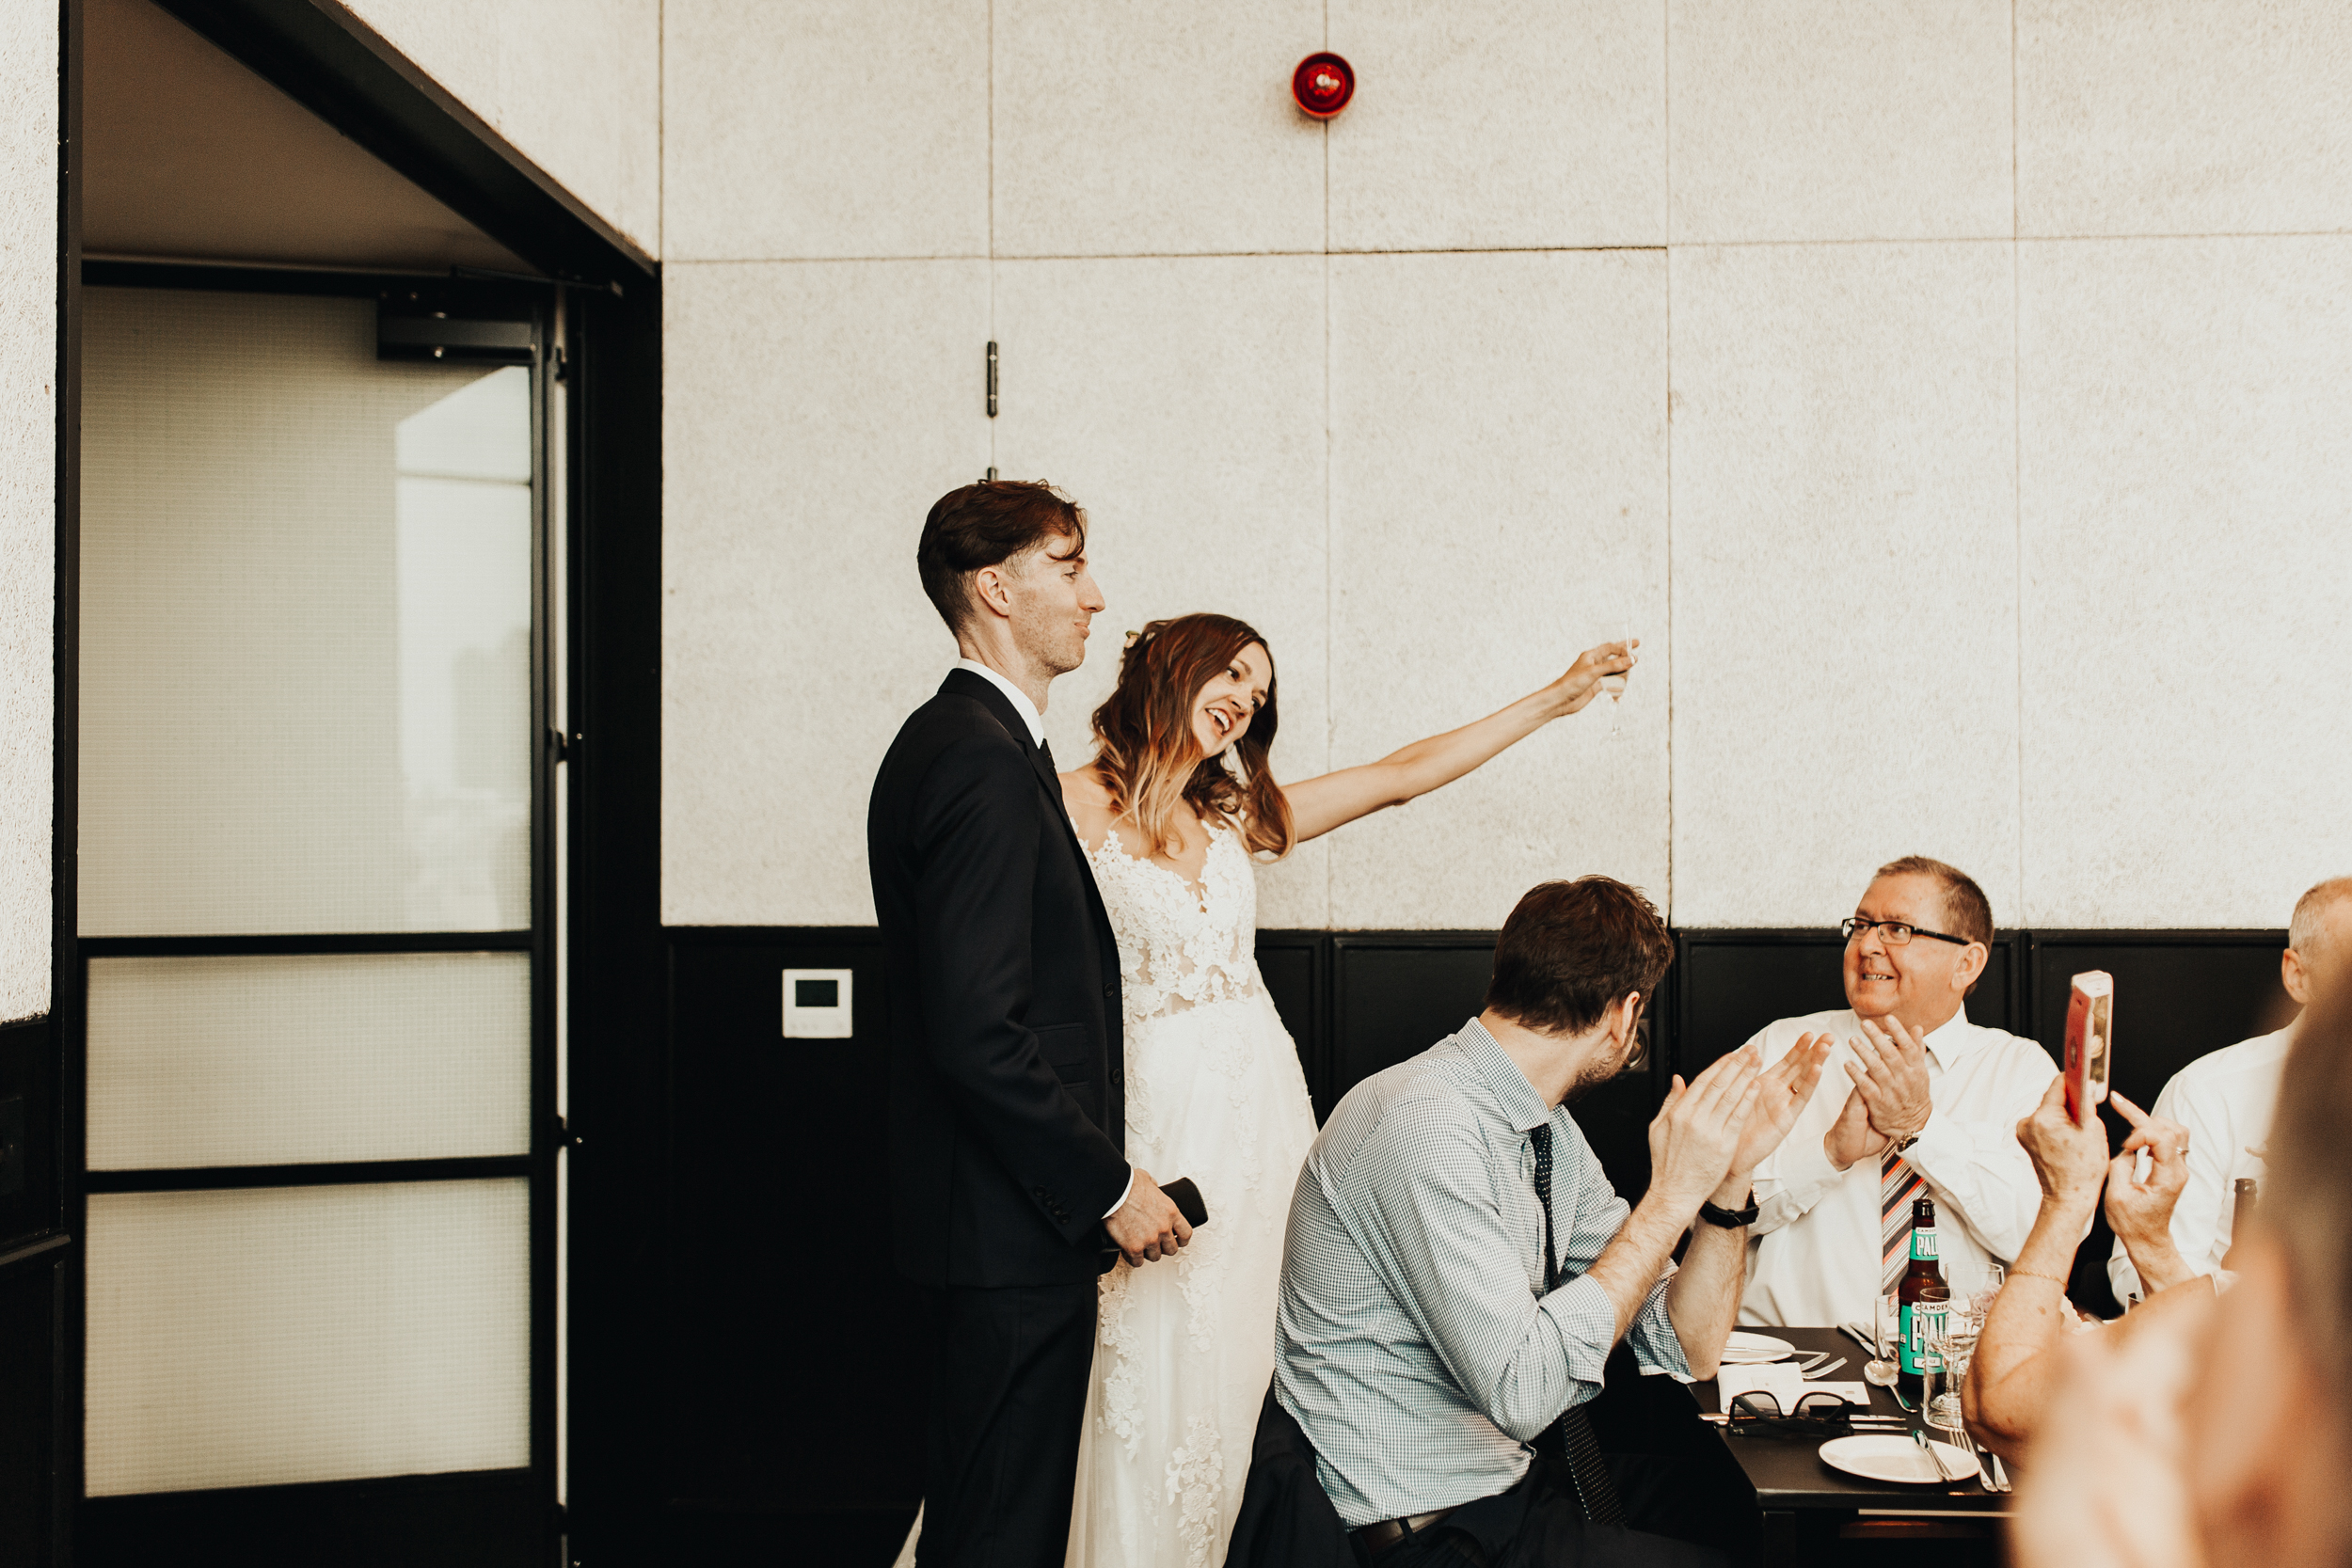 Laura-Benn-The-Asylum-London-The-Ace-Hotel-Wedding-Alternative-Darina-Stoda-Photography-632.jpg